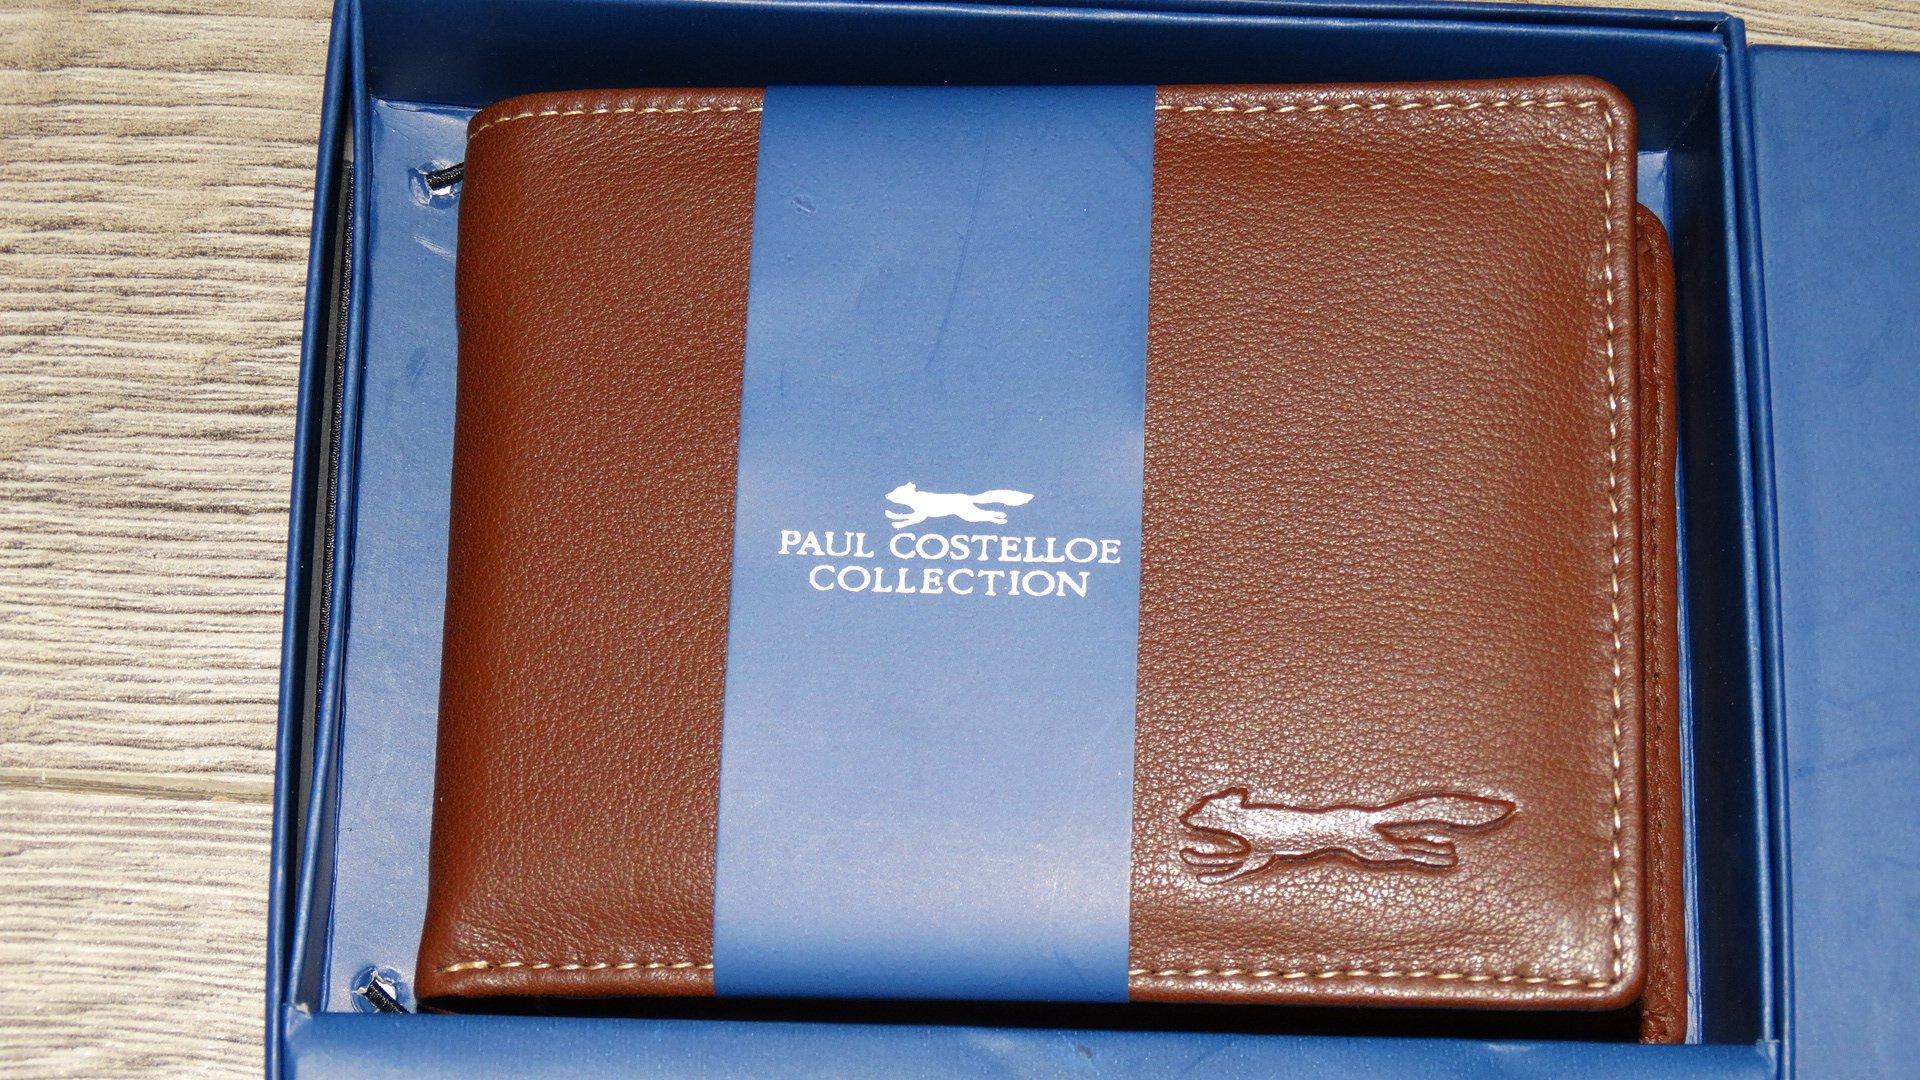 c9477c86299ff Portfel PAUL COSTELLOE Belize brązowy nowy 7856678584 - Allegro.pl